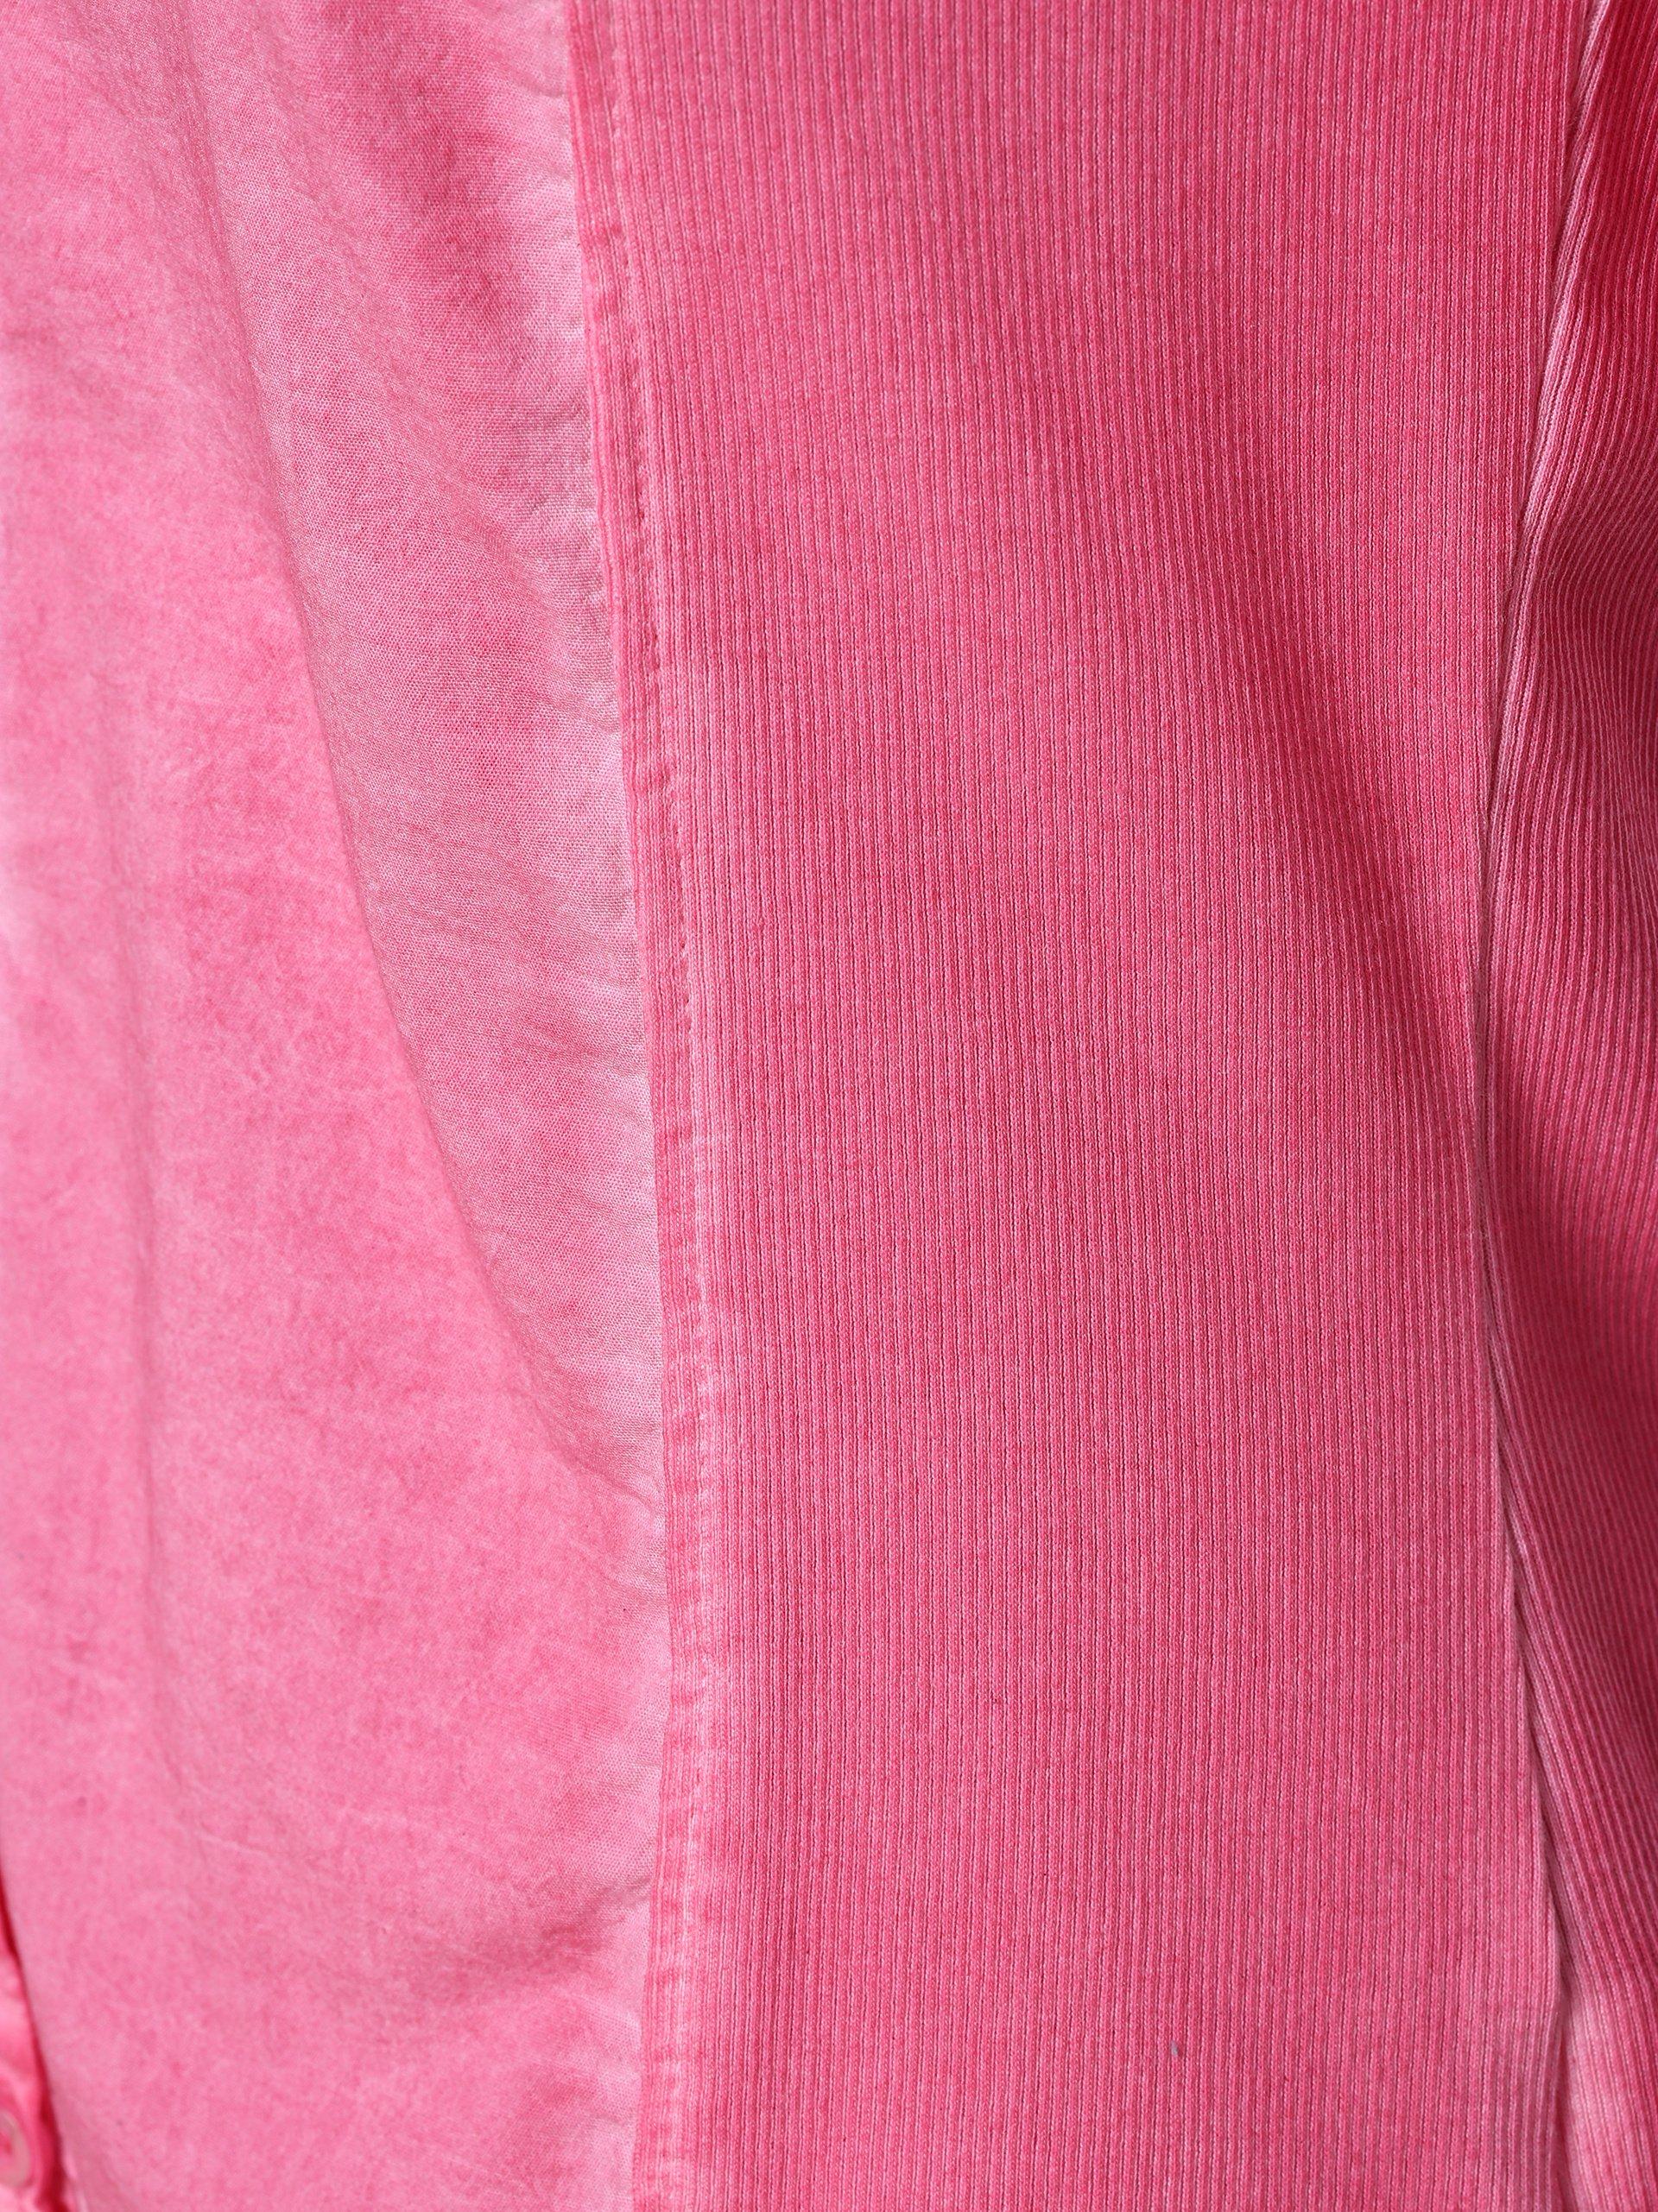 Munich Freedom Damen Blusenshirt